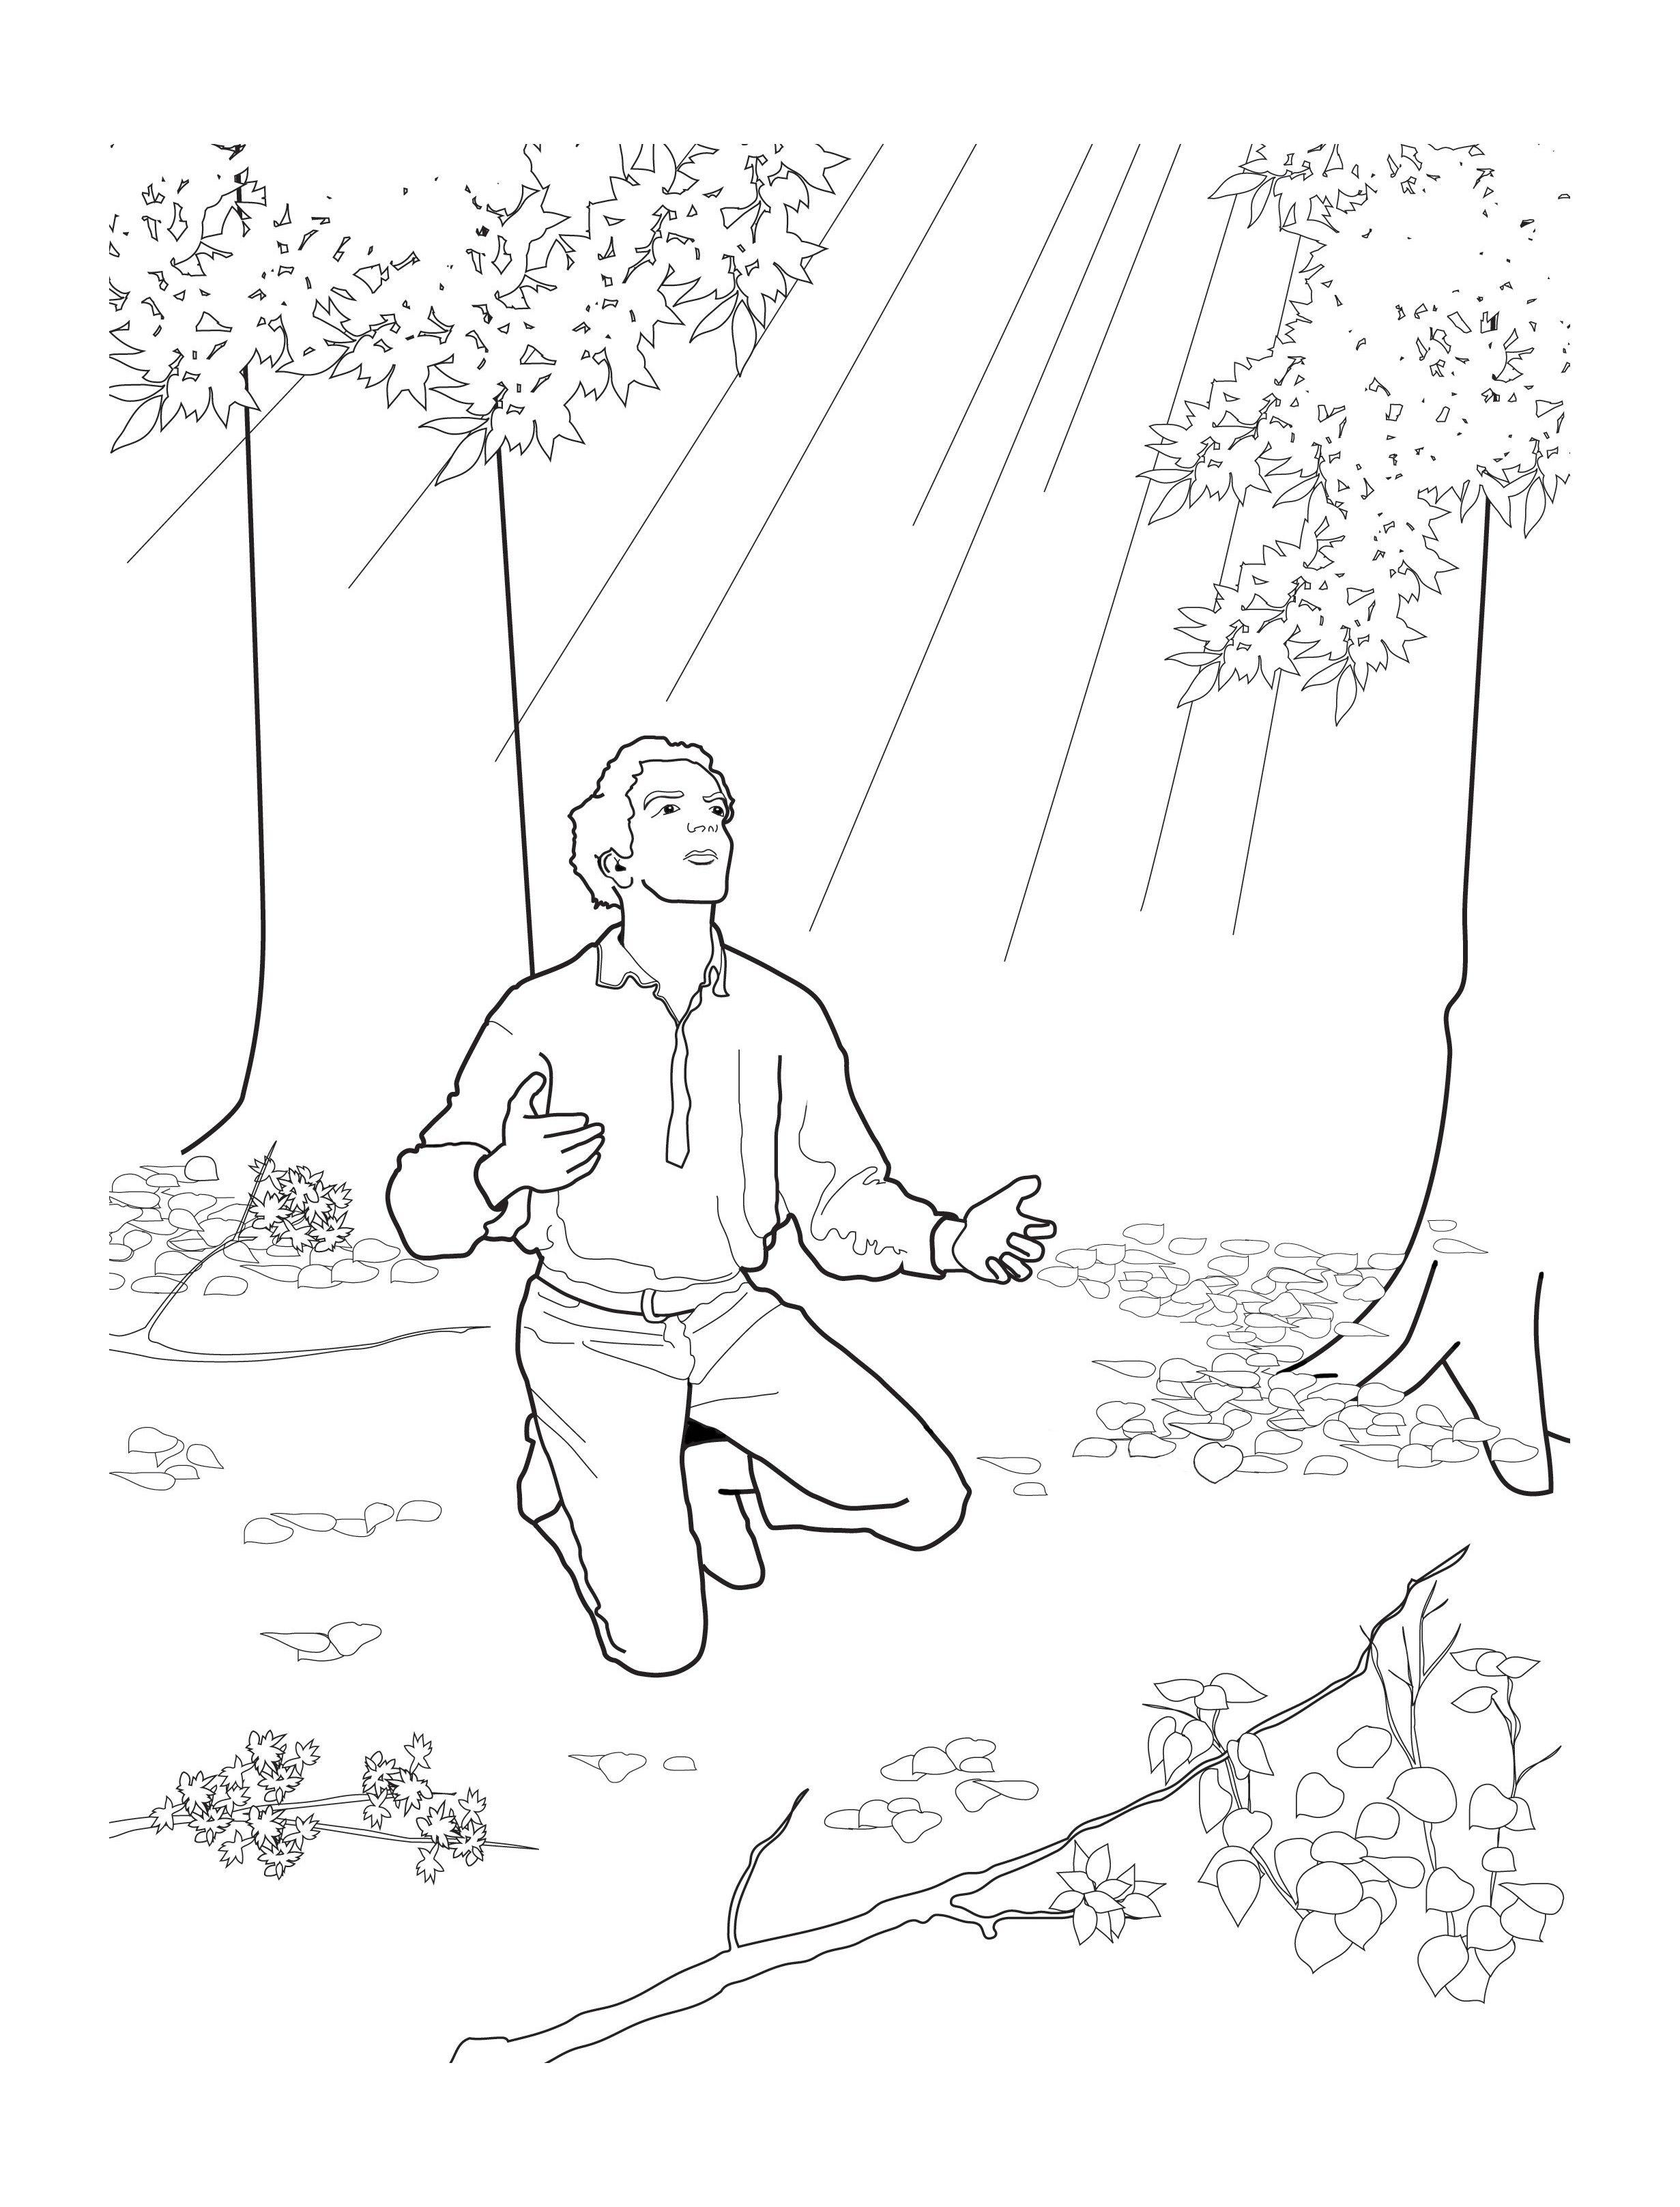 Joseph Smith First Vision Coloring Page : joseph, smith, first, vision, coloring, Joseph, Smith's, First, Prayer